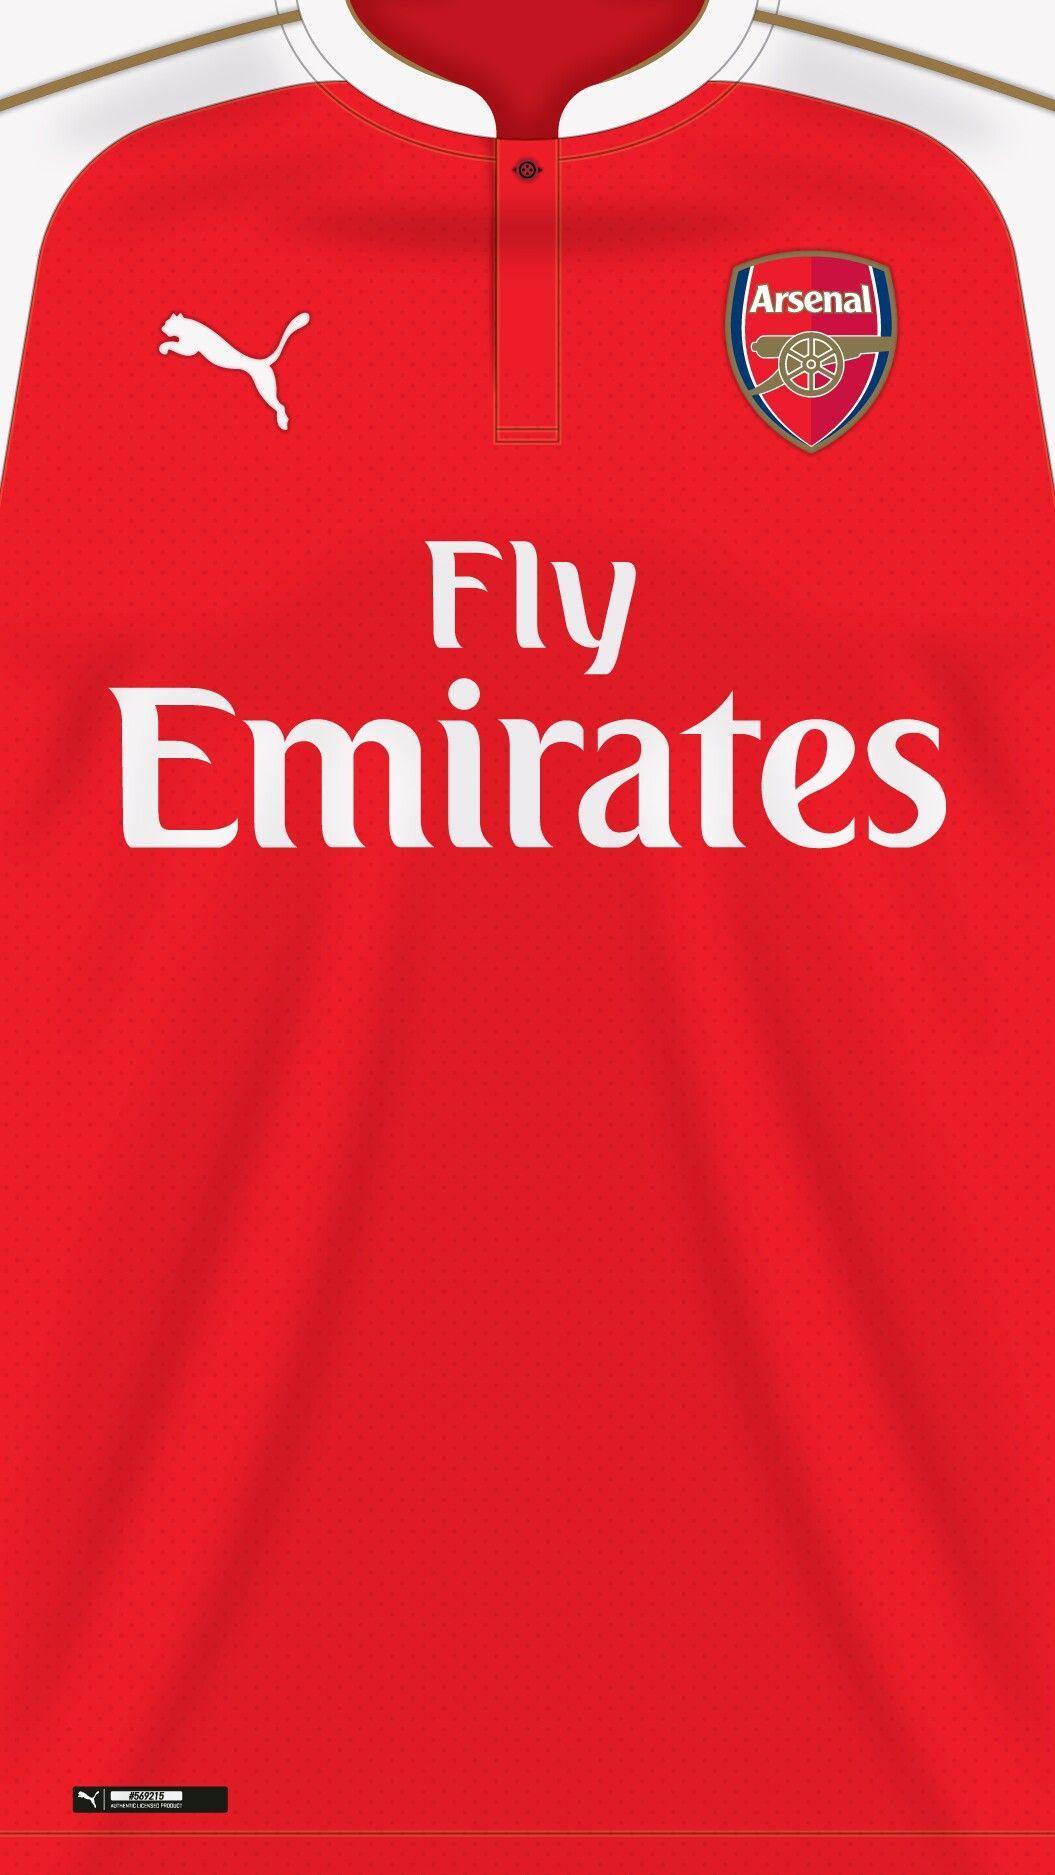 ddcde769 The Gunners Arsenal FC Wallpaper | Wallpaper | Pinterest | Arsenal .